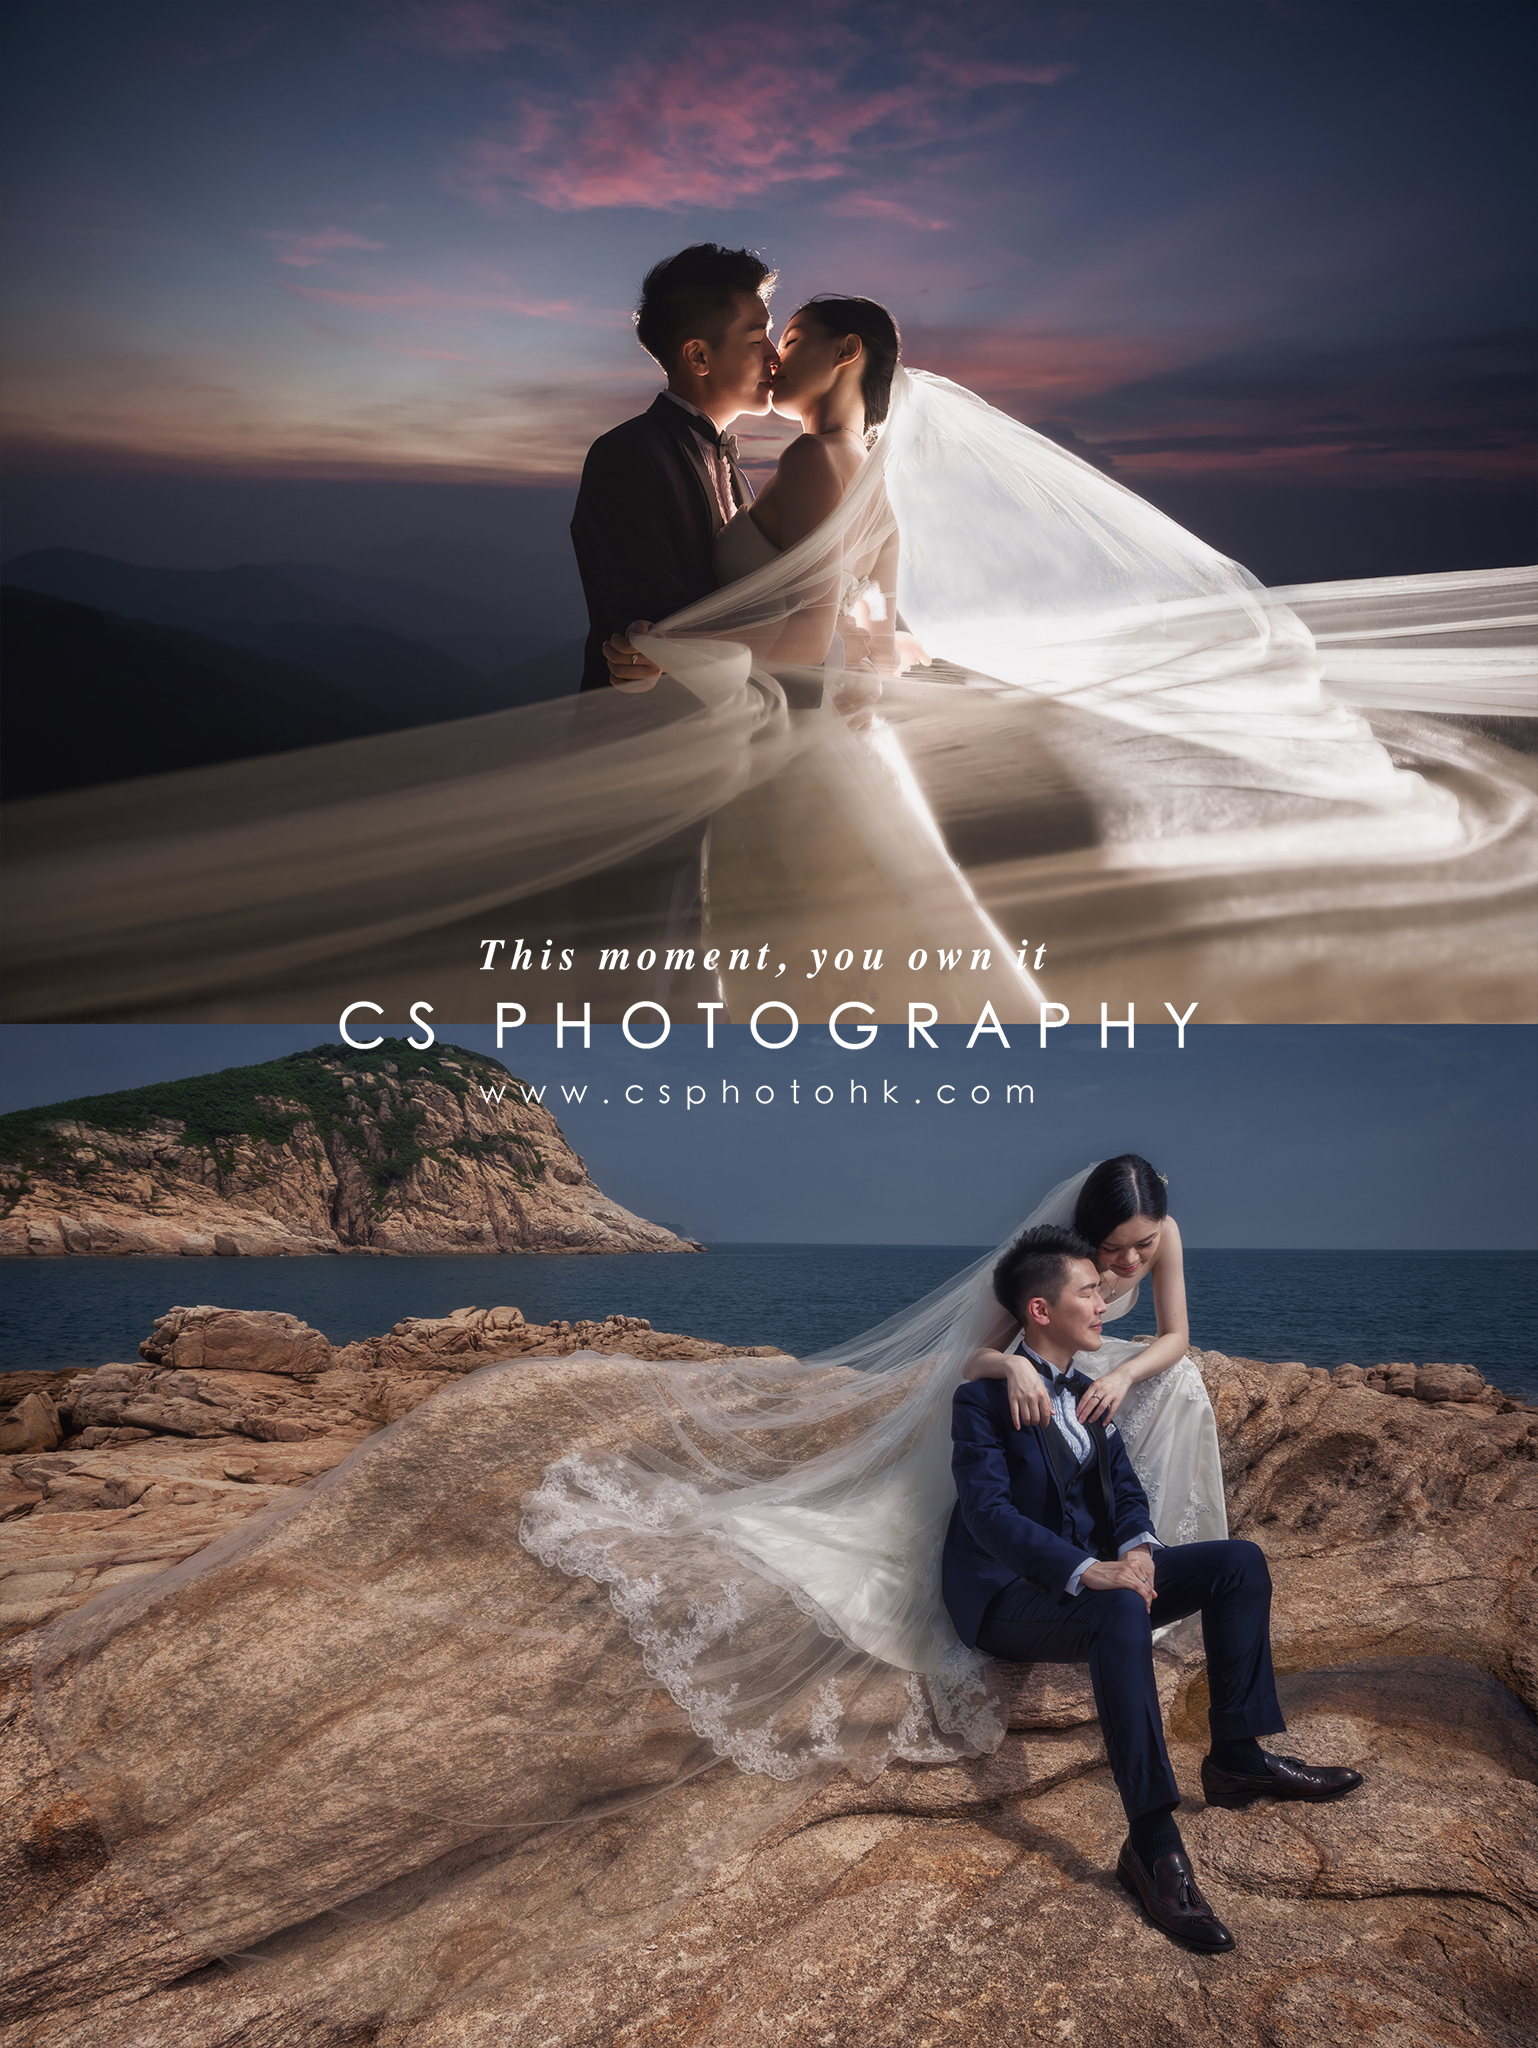 Pre wedding pictures hk discuss